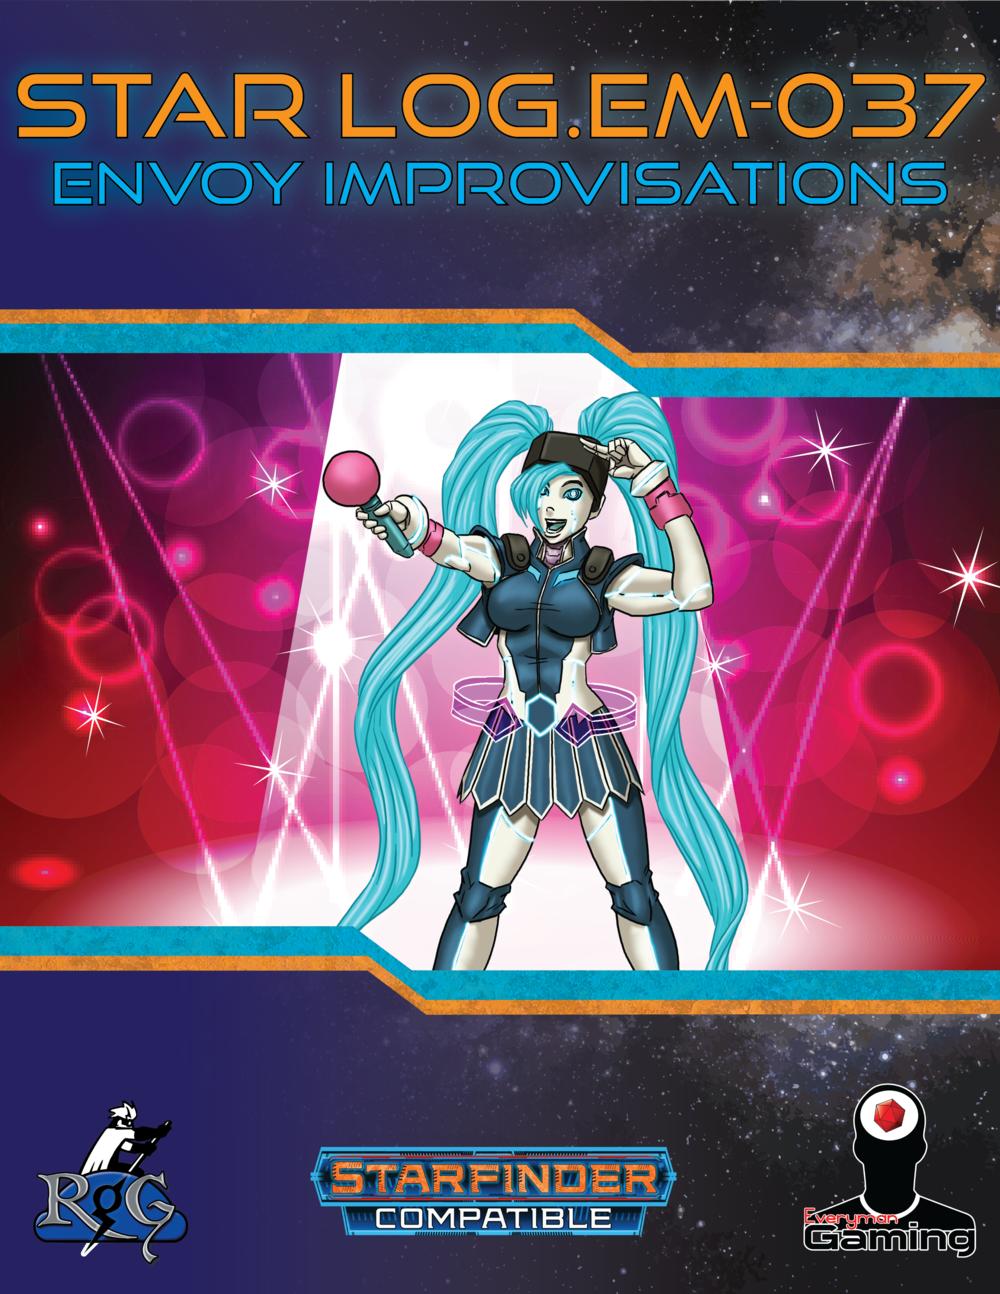 SF037 Envoy Improvisations.png